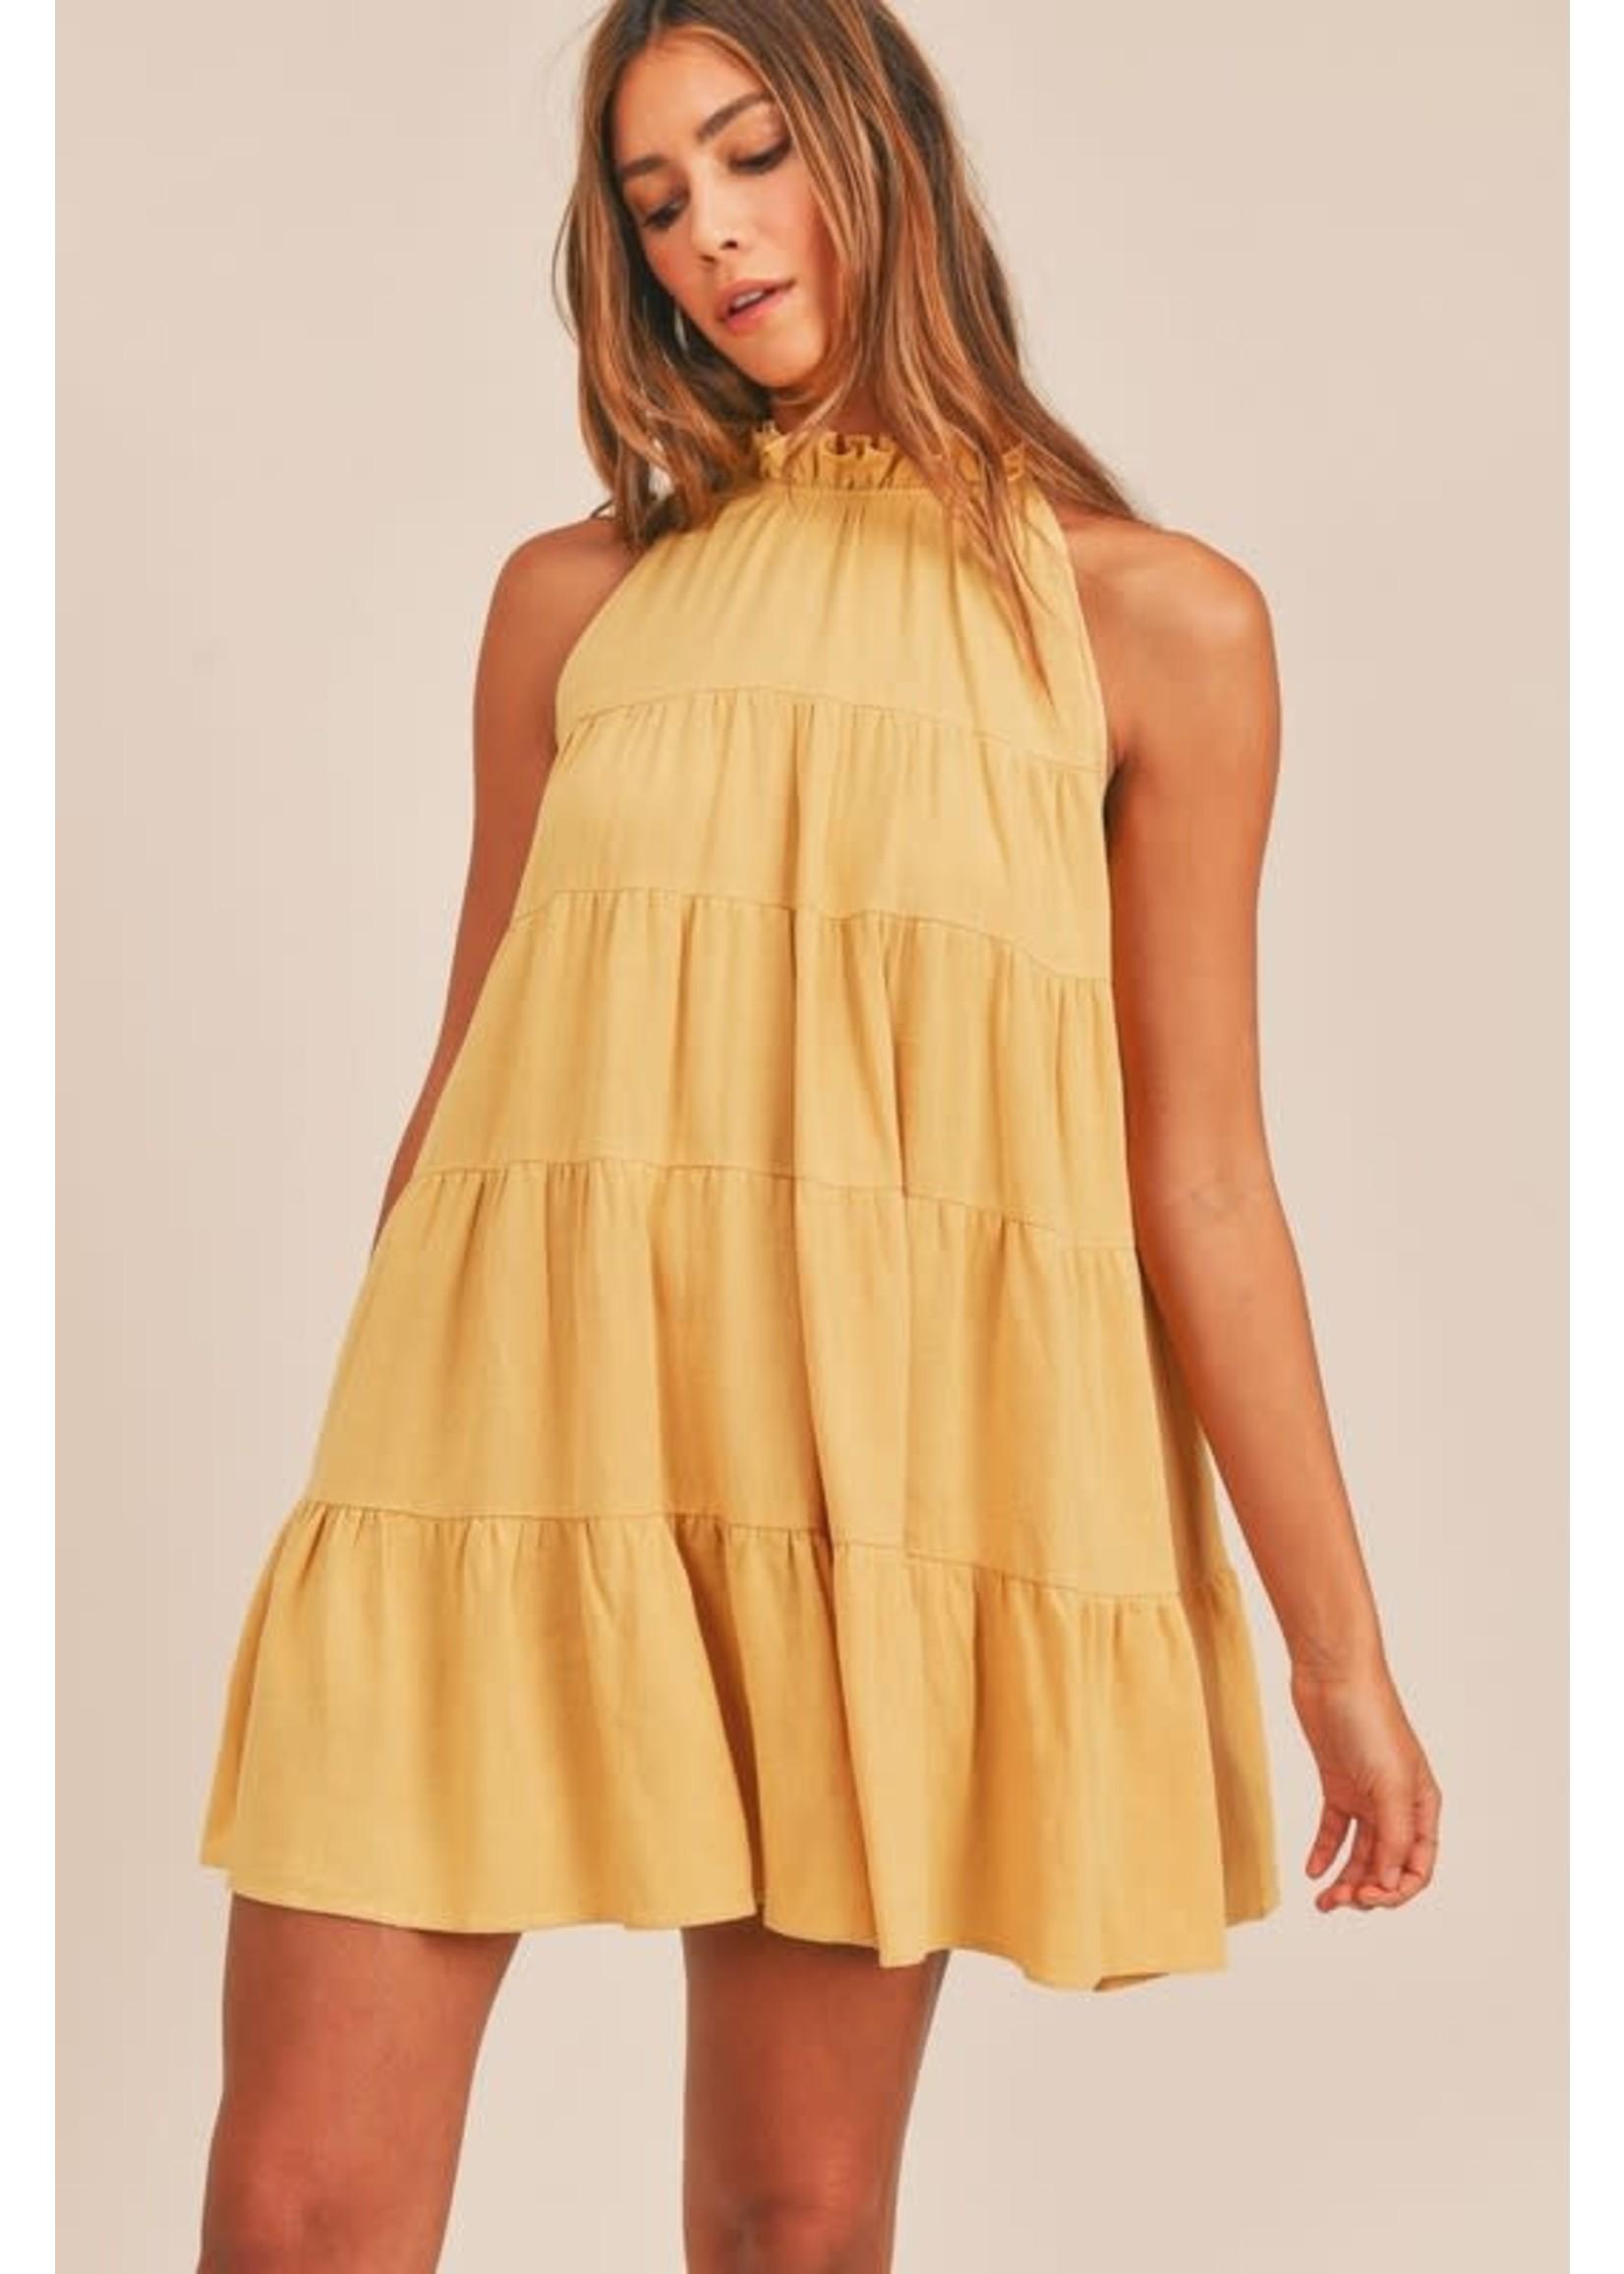 Mable Sleeveless Loose Ruffled Mini Dress - MD2352A